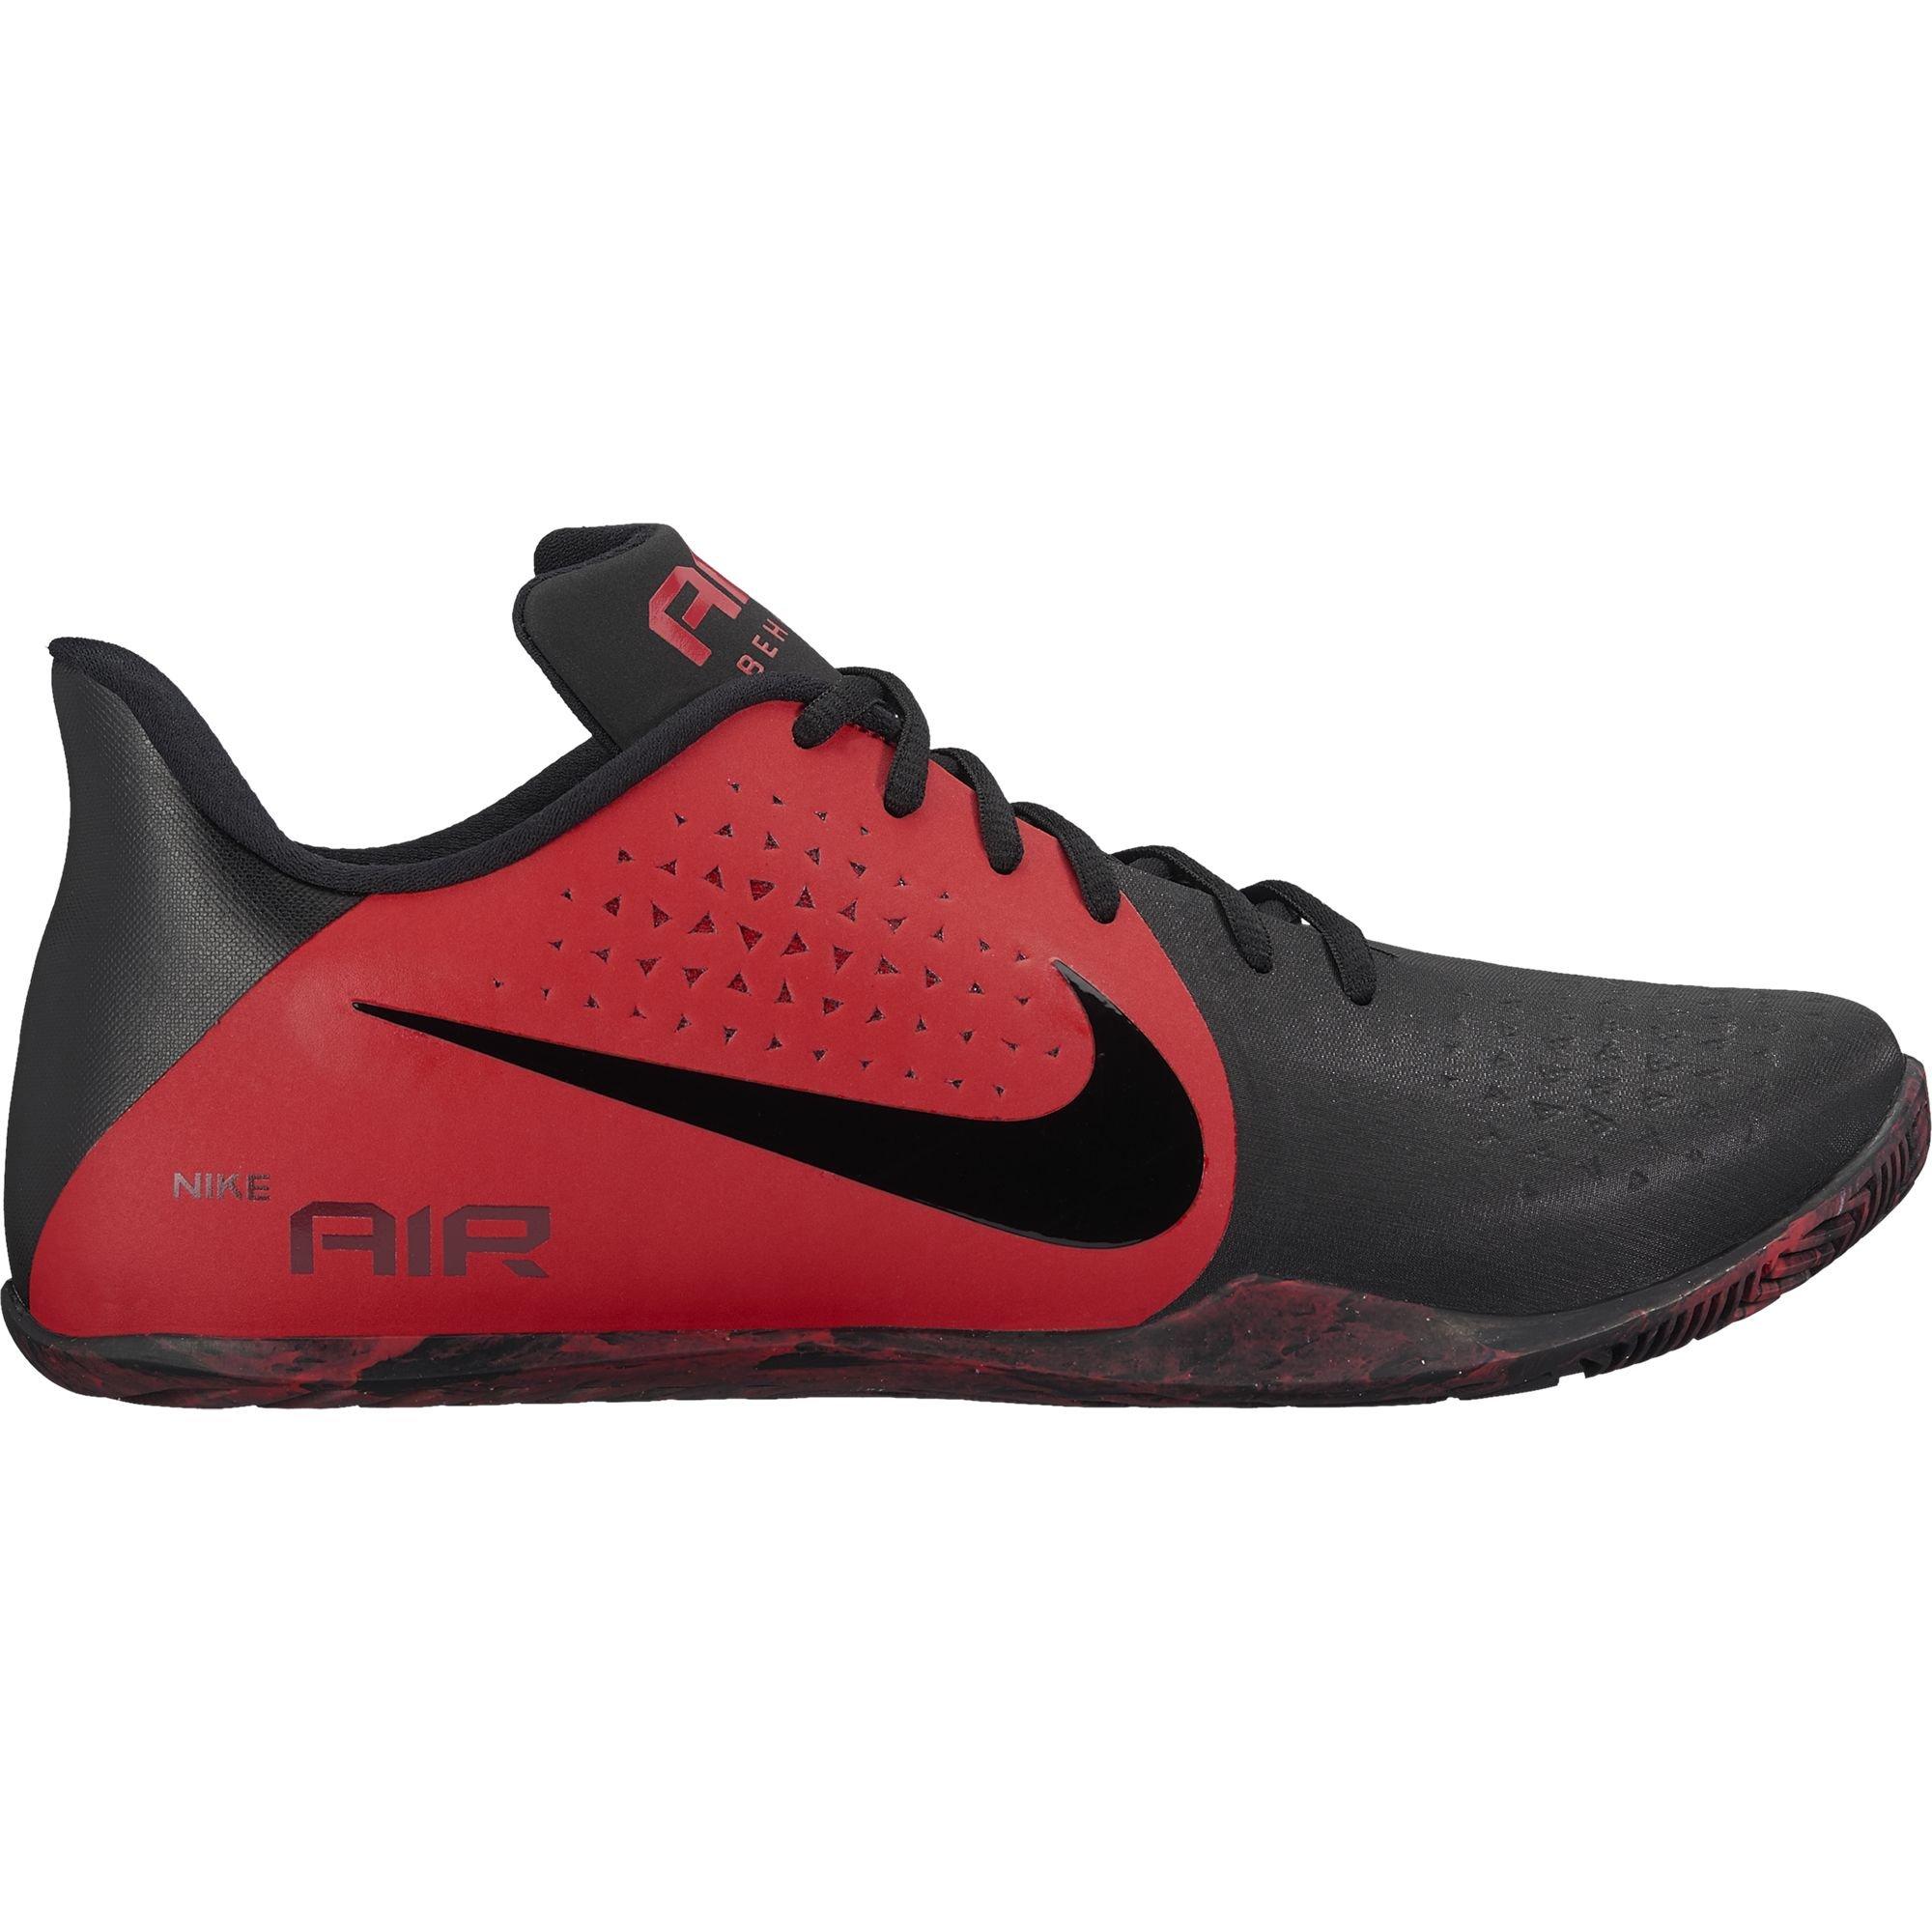 9b19da7d0de9 Galleon - NIKE Men s Air Behold Low Basketball Shoe University Red Black Size  14 M US